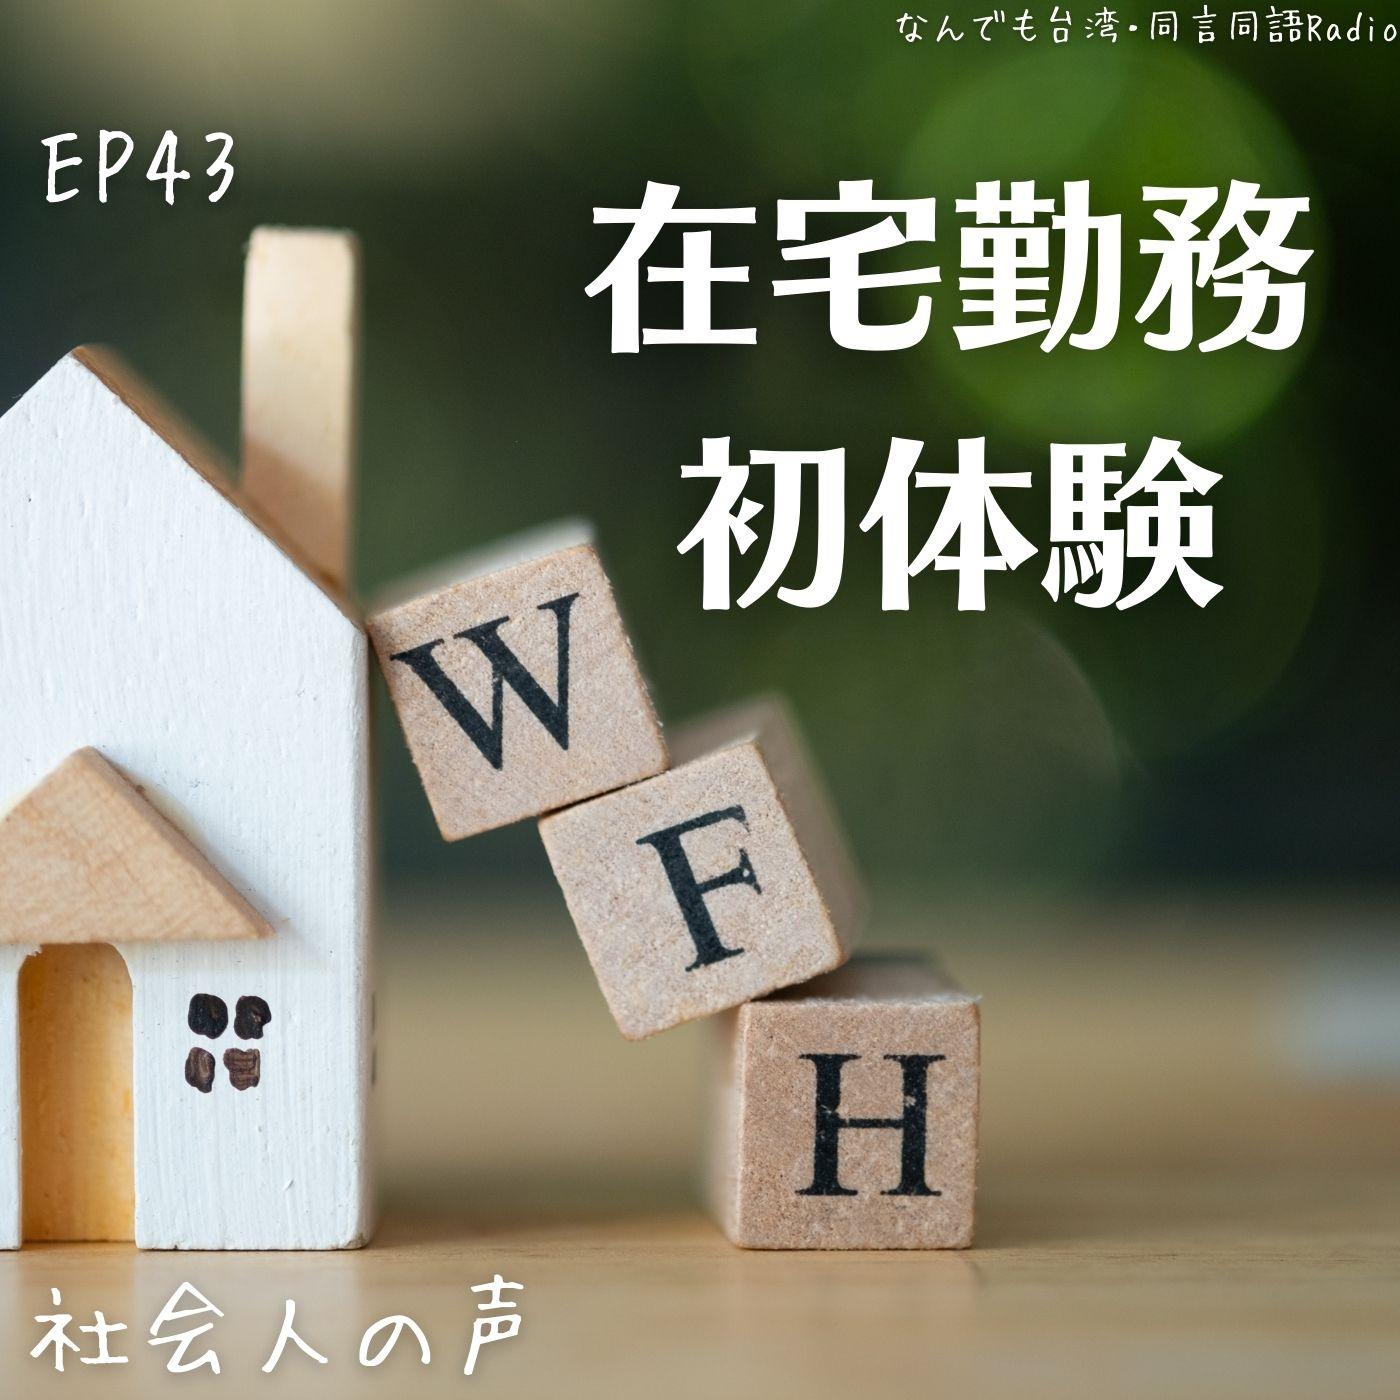 EP43 - (JP)【社会人の声】在宅勤務初体験